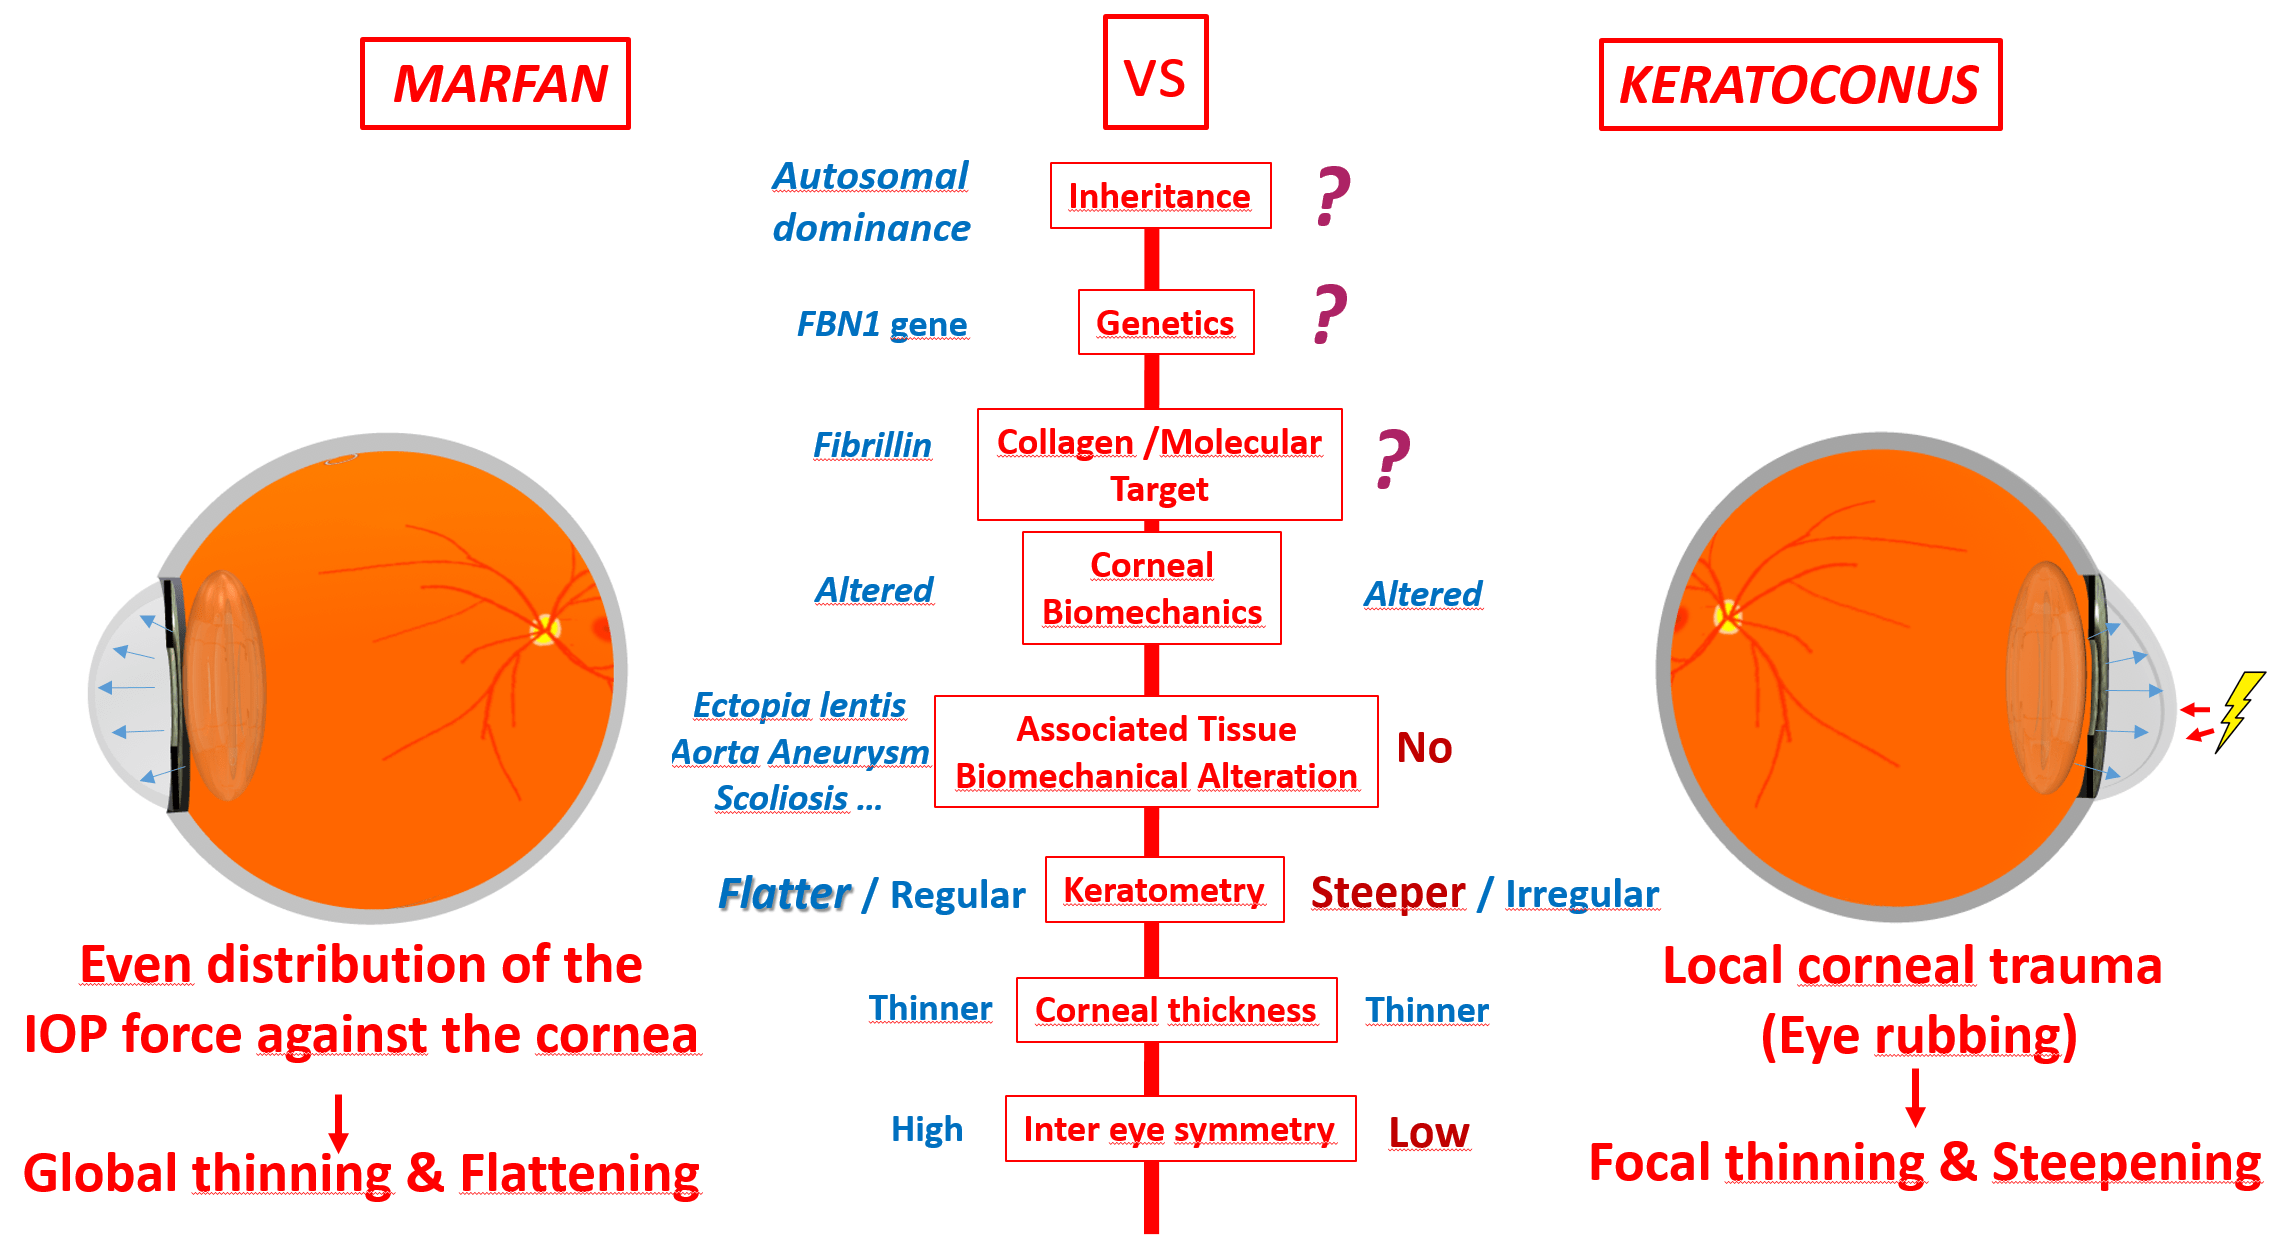 a keratoconus myopia